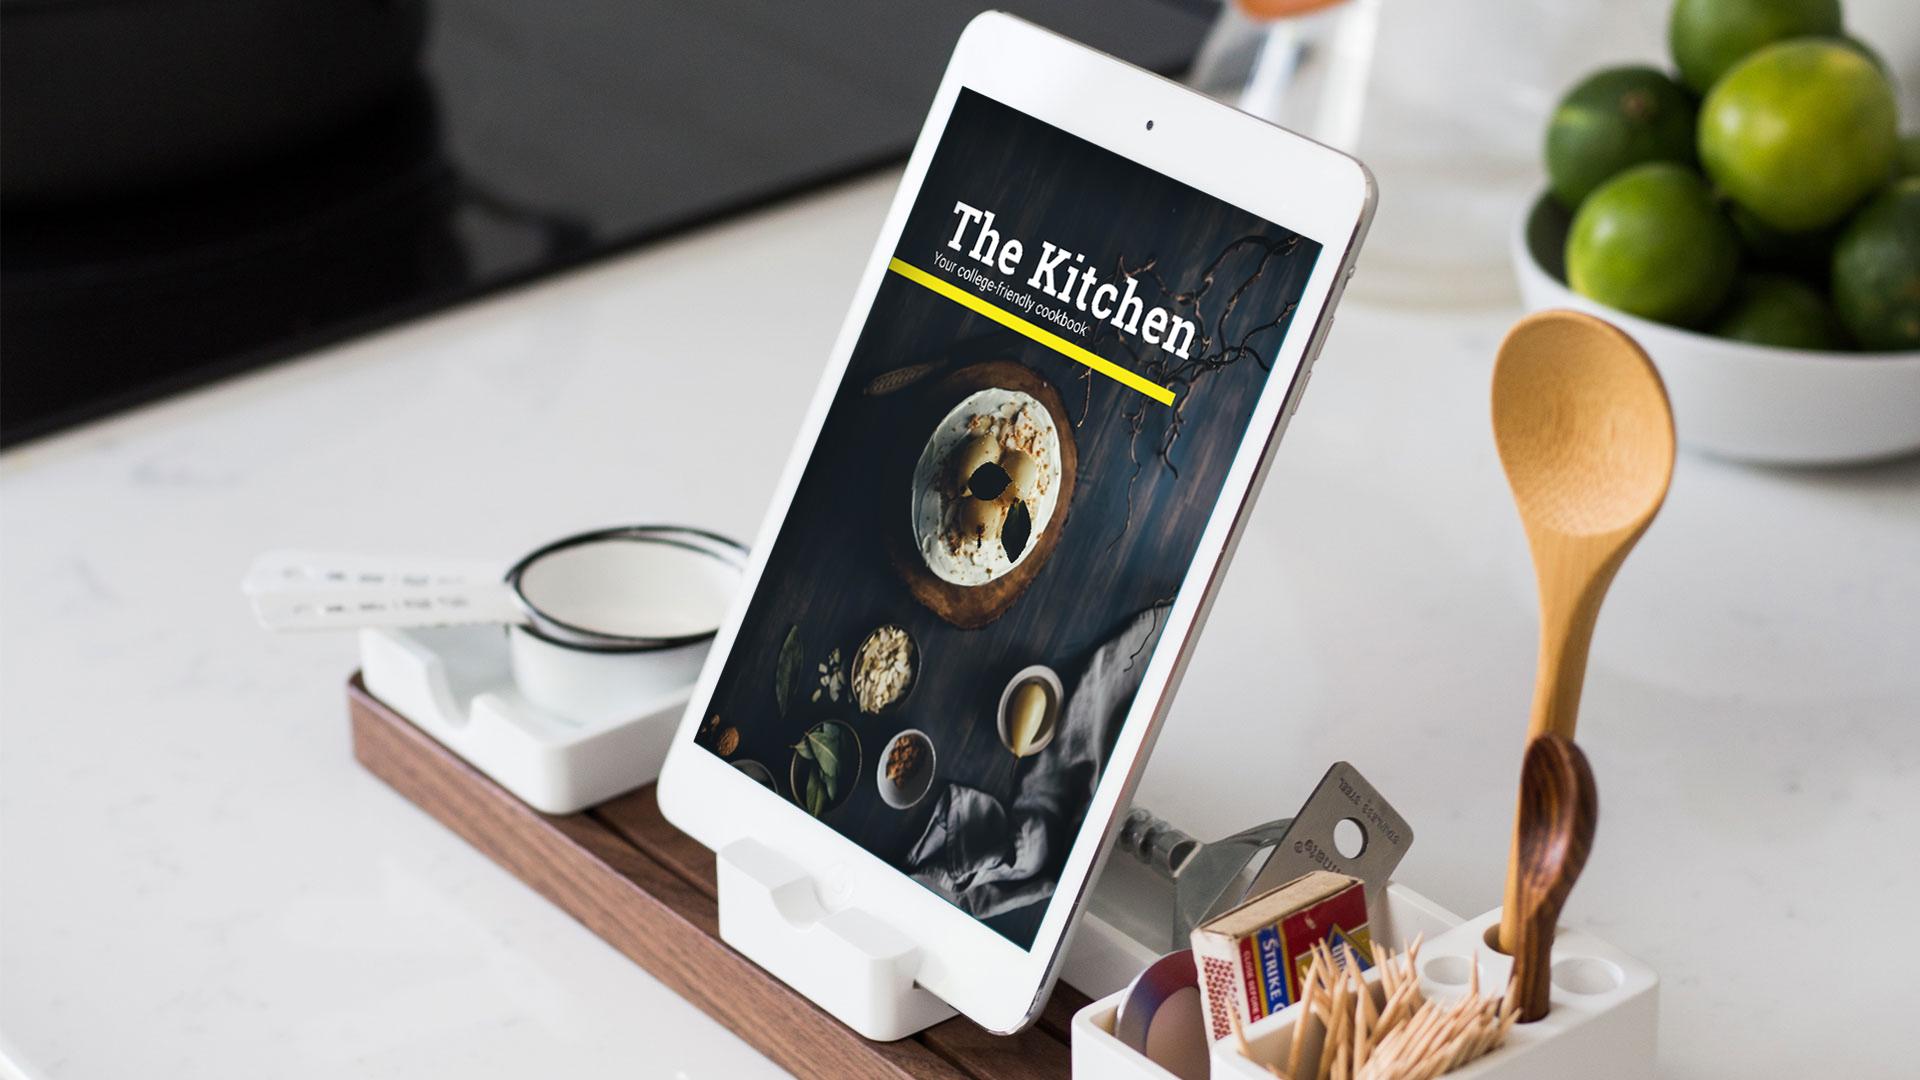 ipad-in-the-kitchen-1 copy.jpg